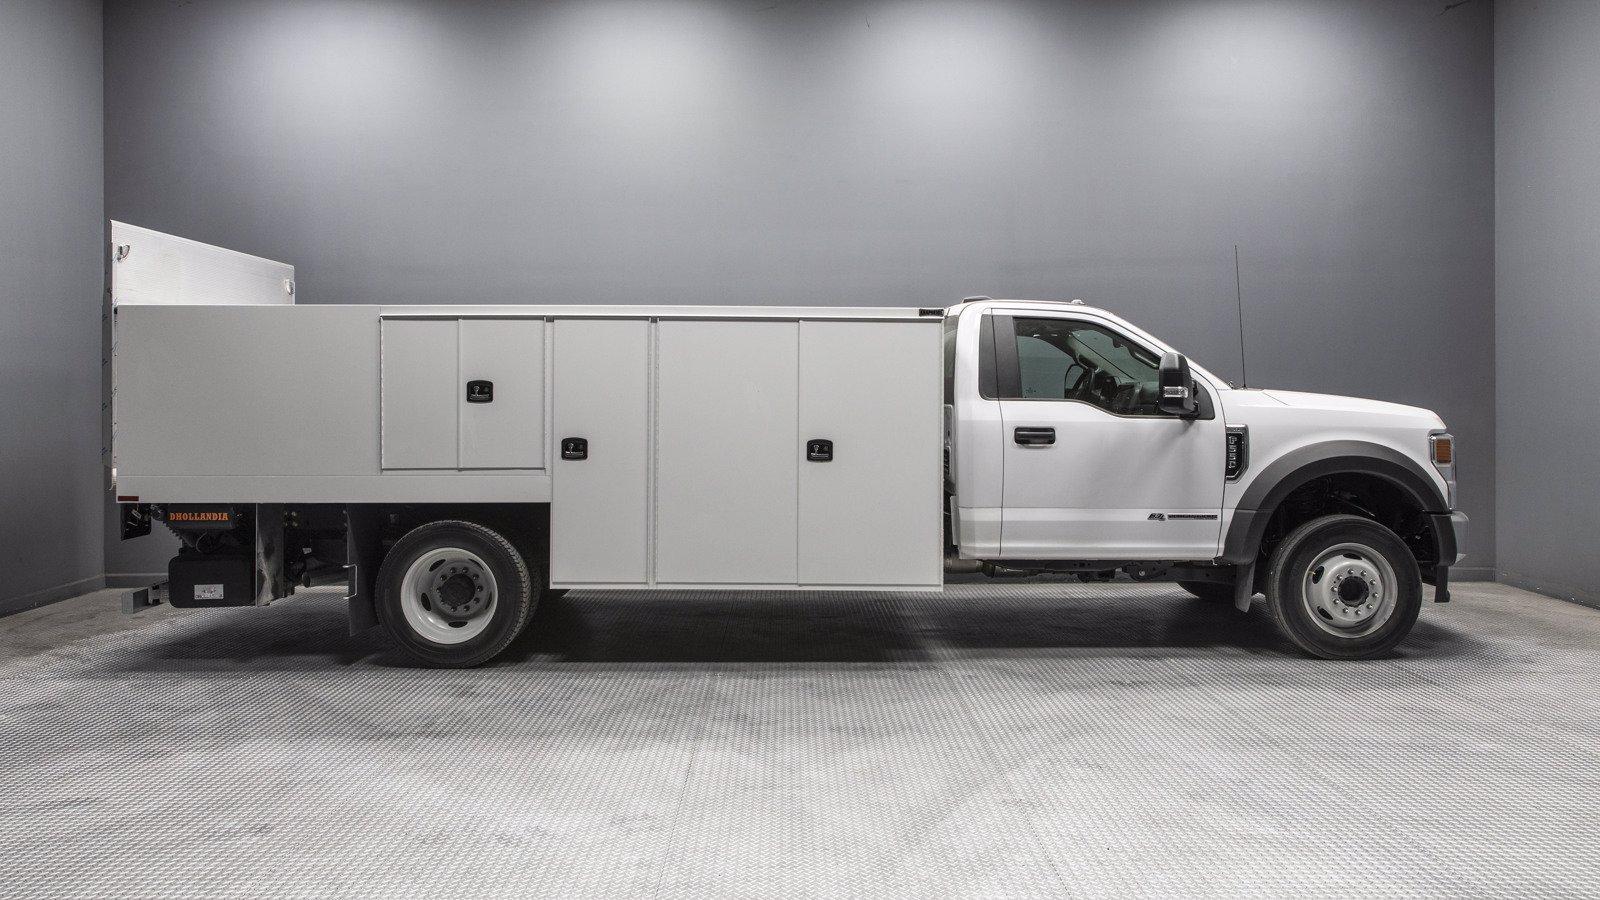 2020 Ford F-550 Regular Cab DRW 4x2, Knapheide Saw Body #04080 - photo 4